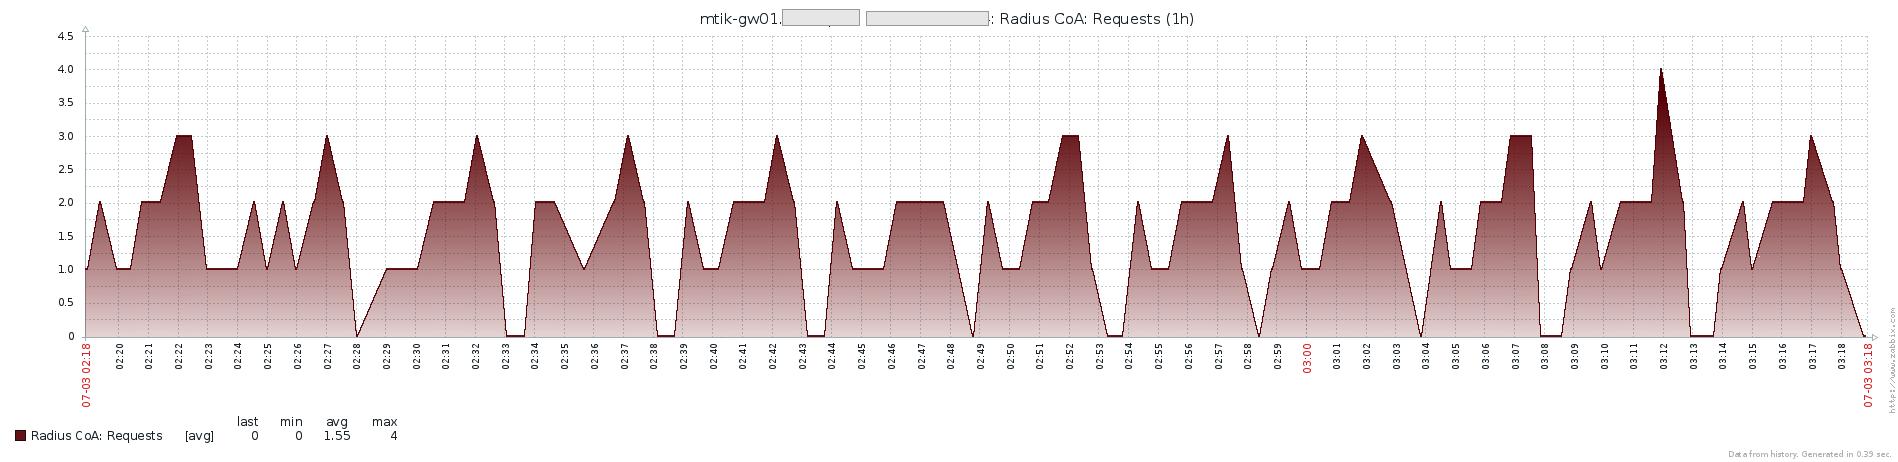 Zabbix Share - Mikrotik Extended Monitoring (BGP, Radius, Firewall